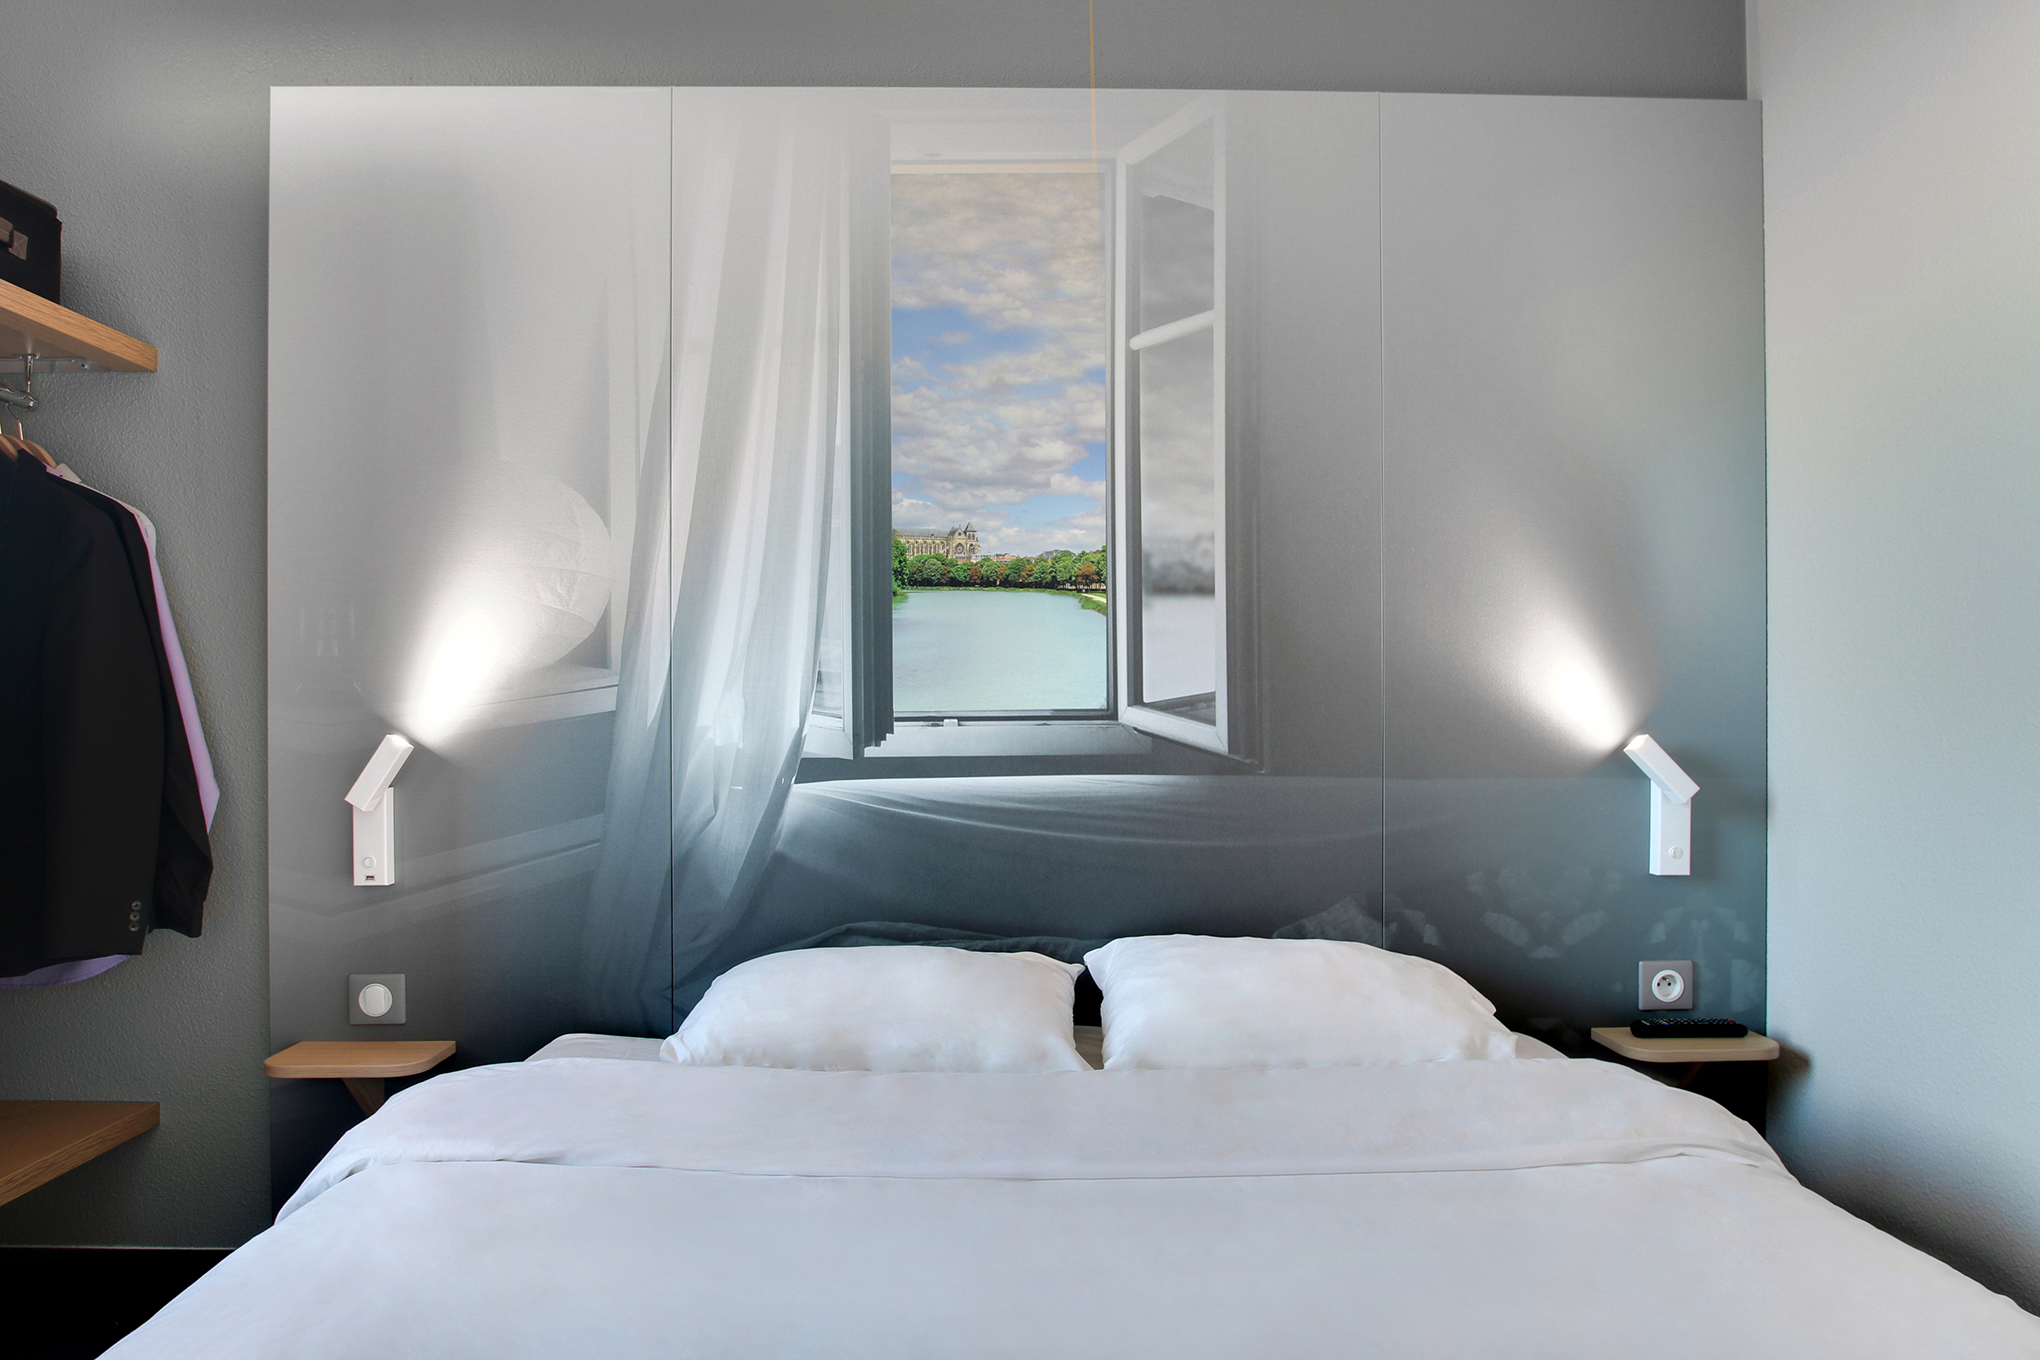 b b h tel ch lons en champagne h tel 5 rue michel menard 51000 ch lons en champagne adresse. Black Bedroom Furniture Sets. Home Design Ideas